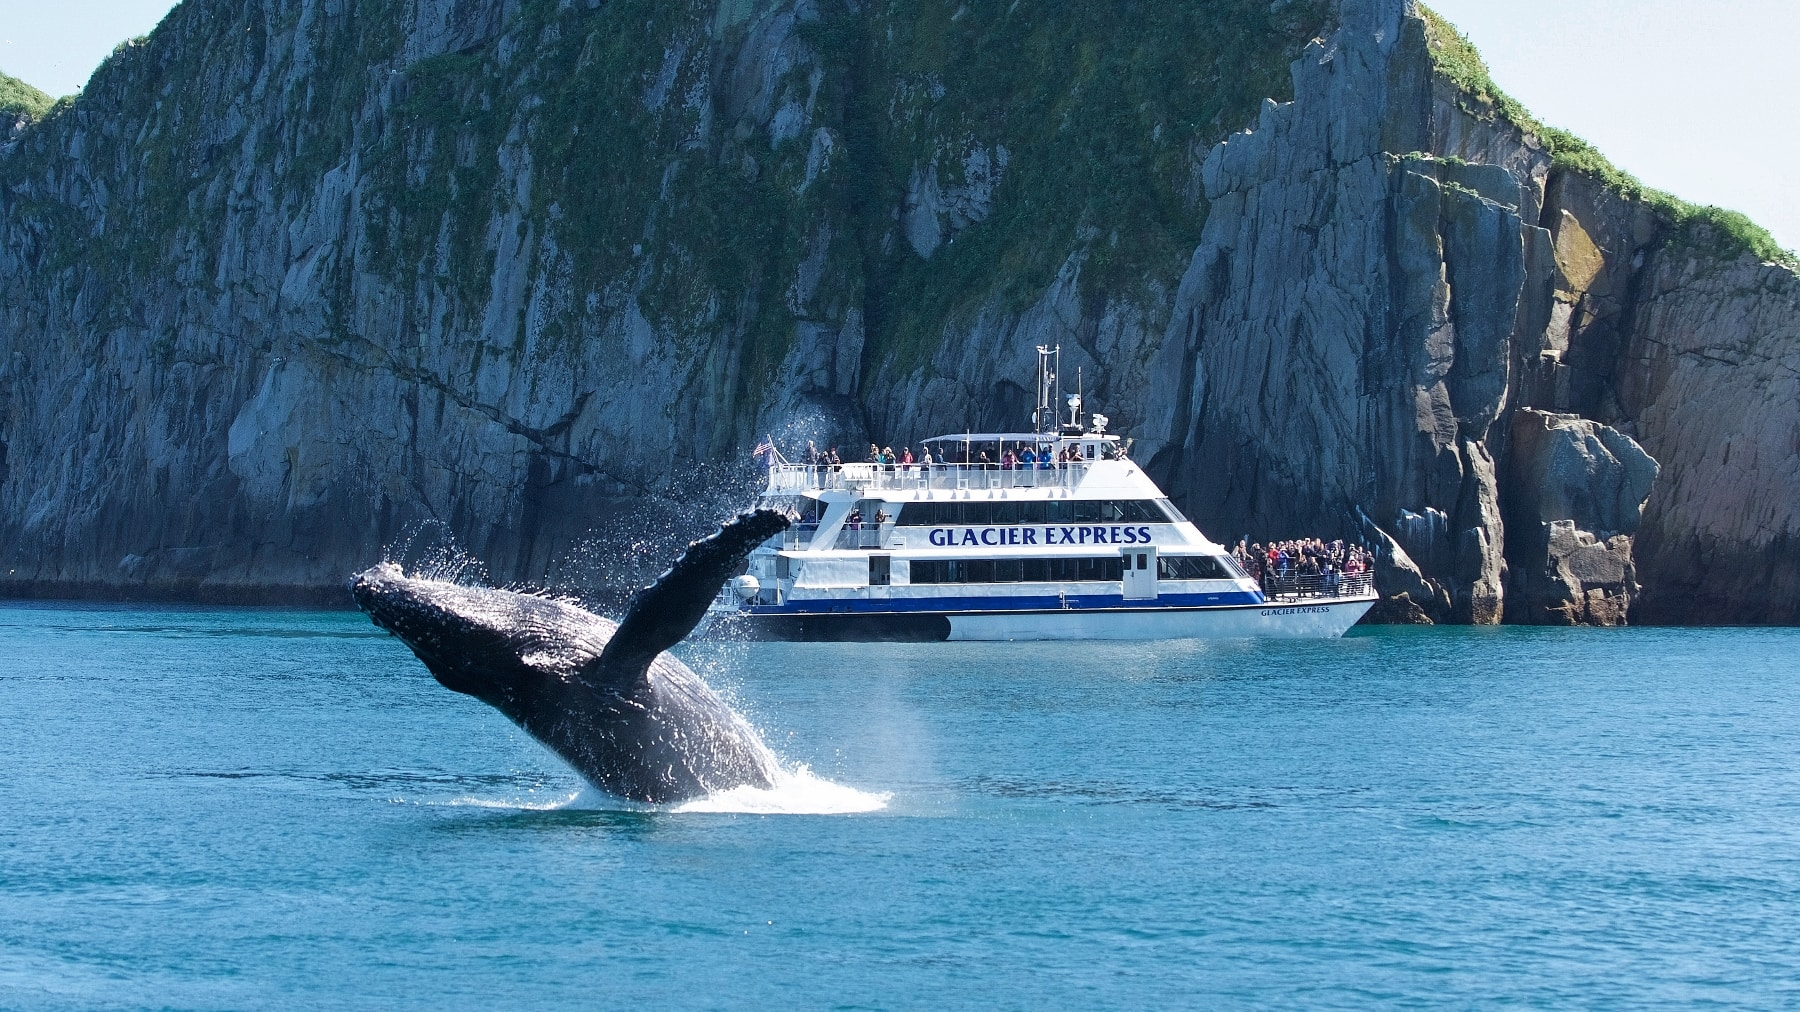 Humpback-Whale-Breach-GX-2-1800x1012-1.jpg